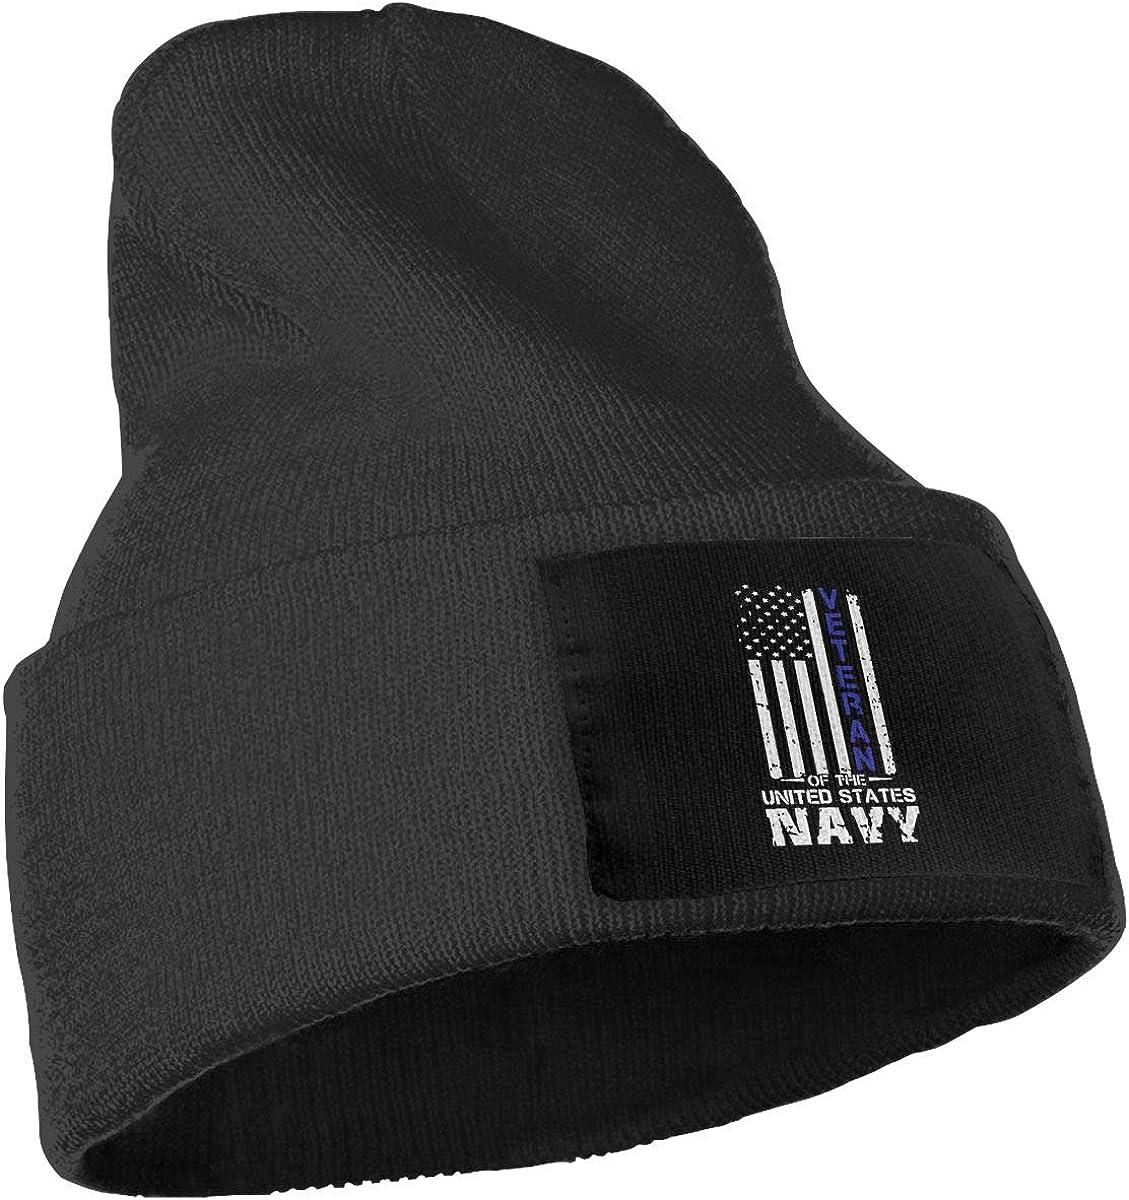 COLLJL-8 Men /& Women US Navy Veteran Outdoor Fashion Knit Beanies Hat Soft Winter Knit Caps